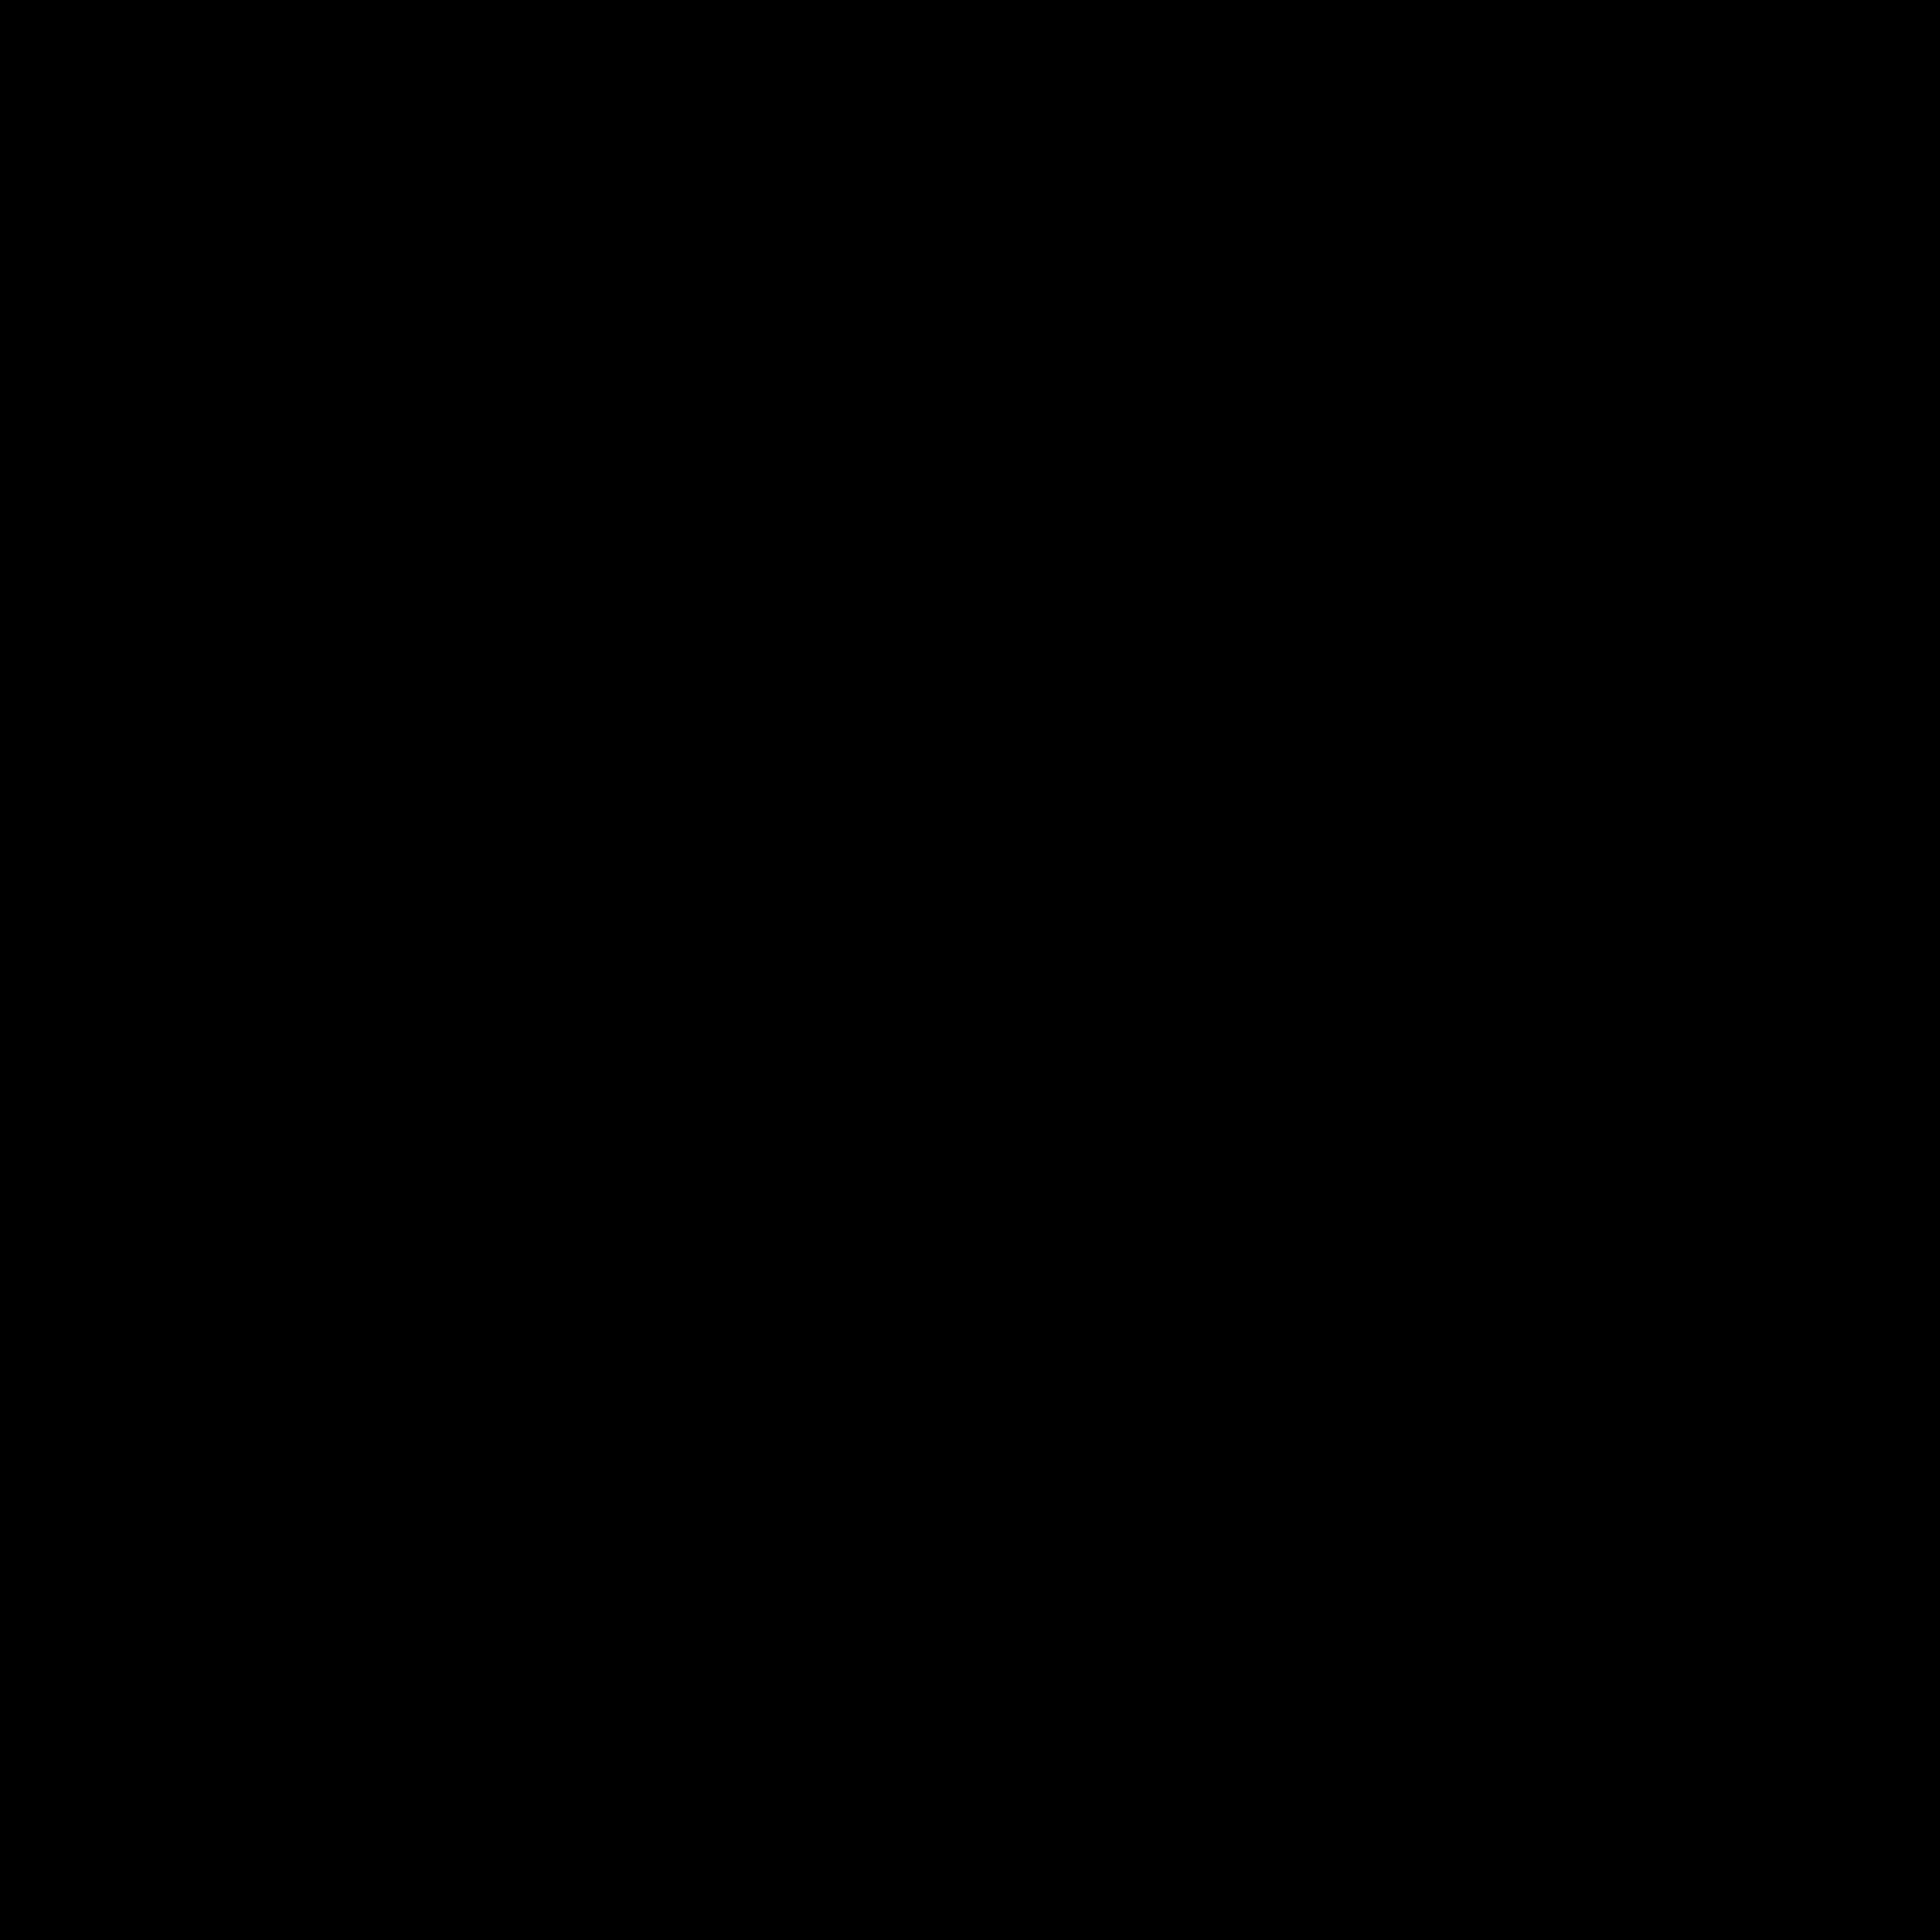 telephone logo clipart best